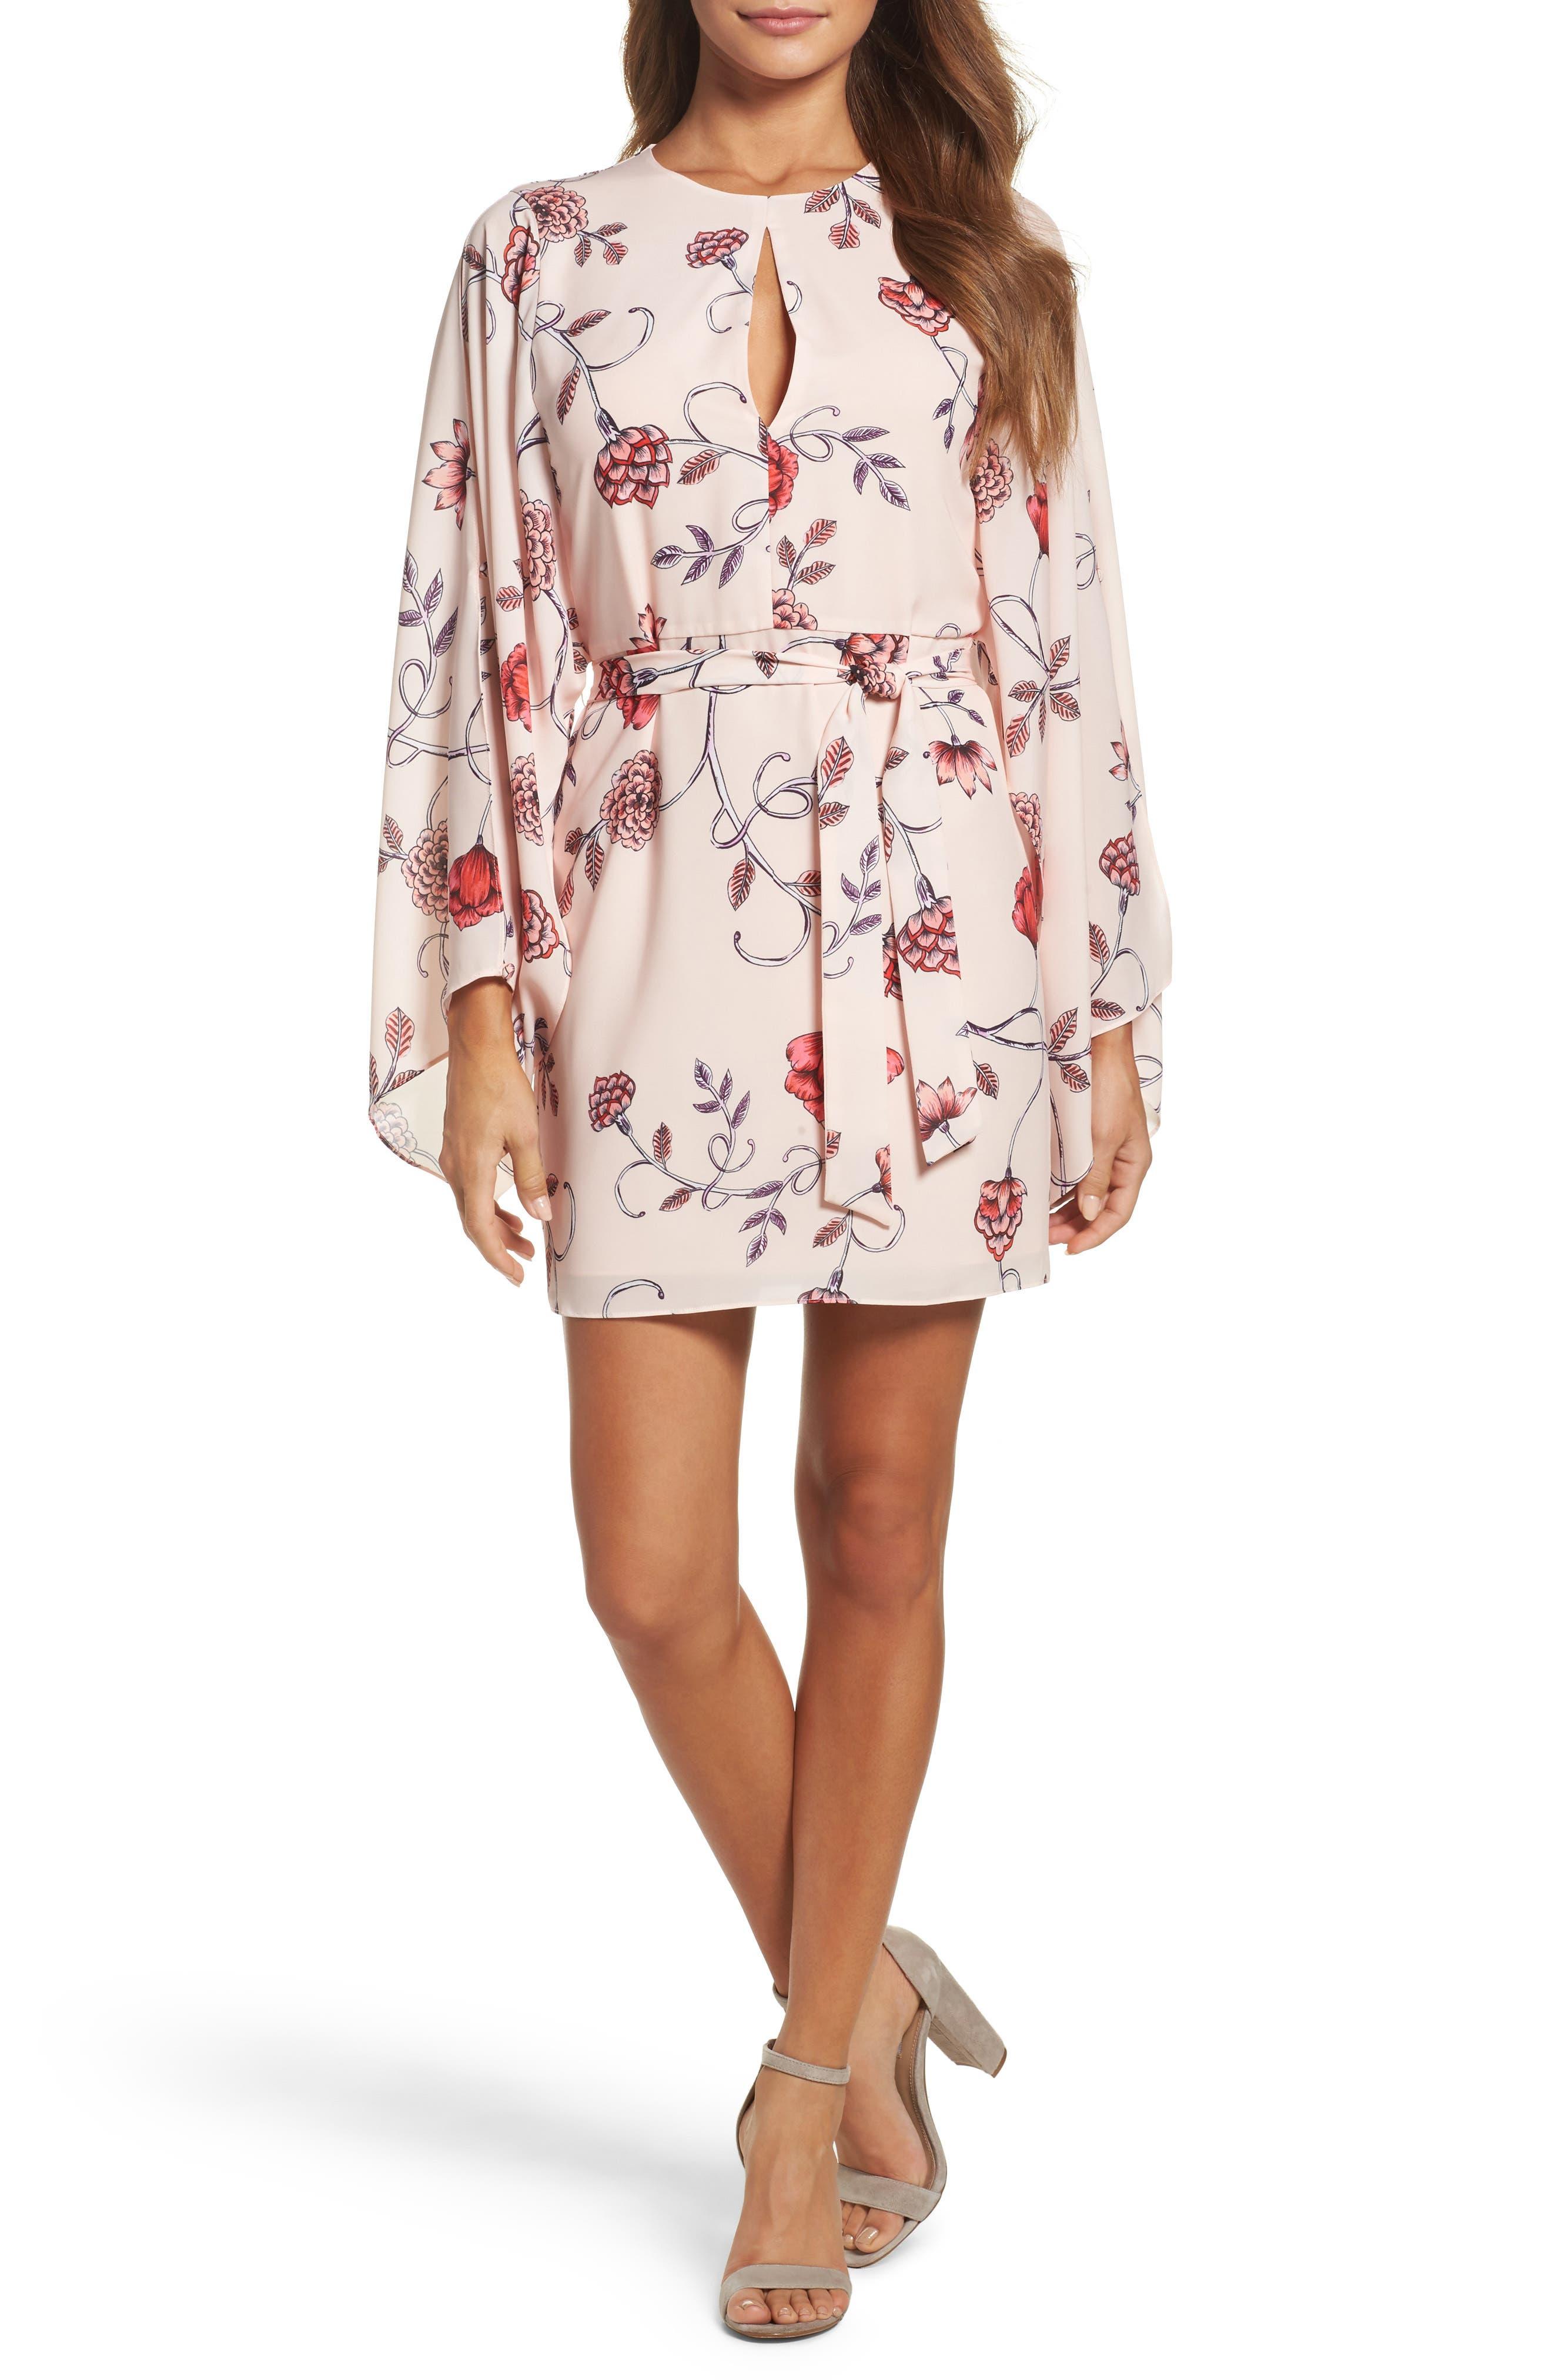 Sakura Bell Sleeve Dress,                         Main,                         color, Pink Print